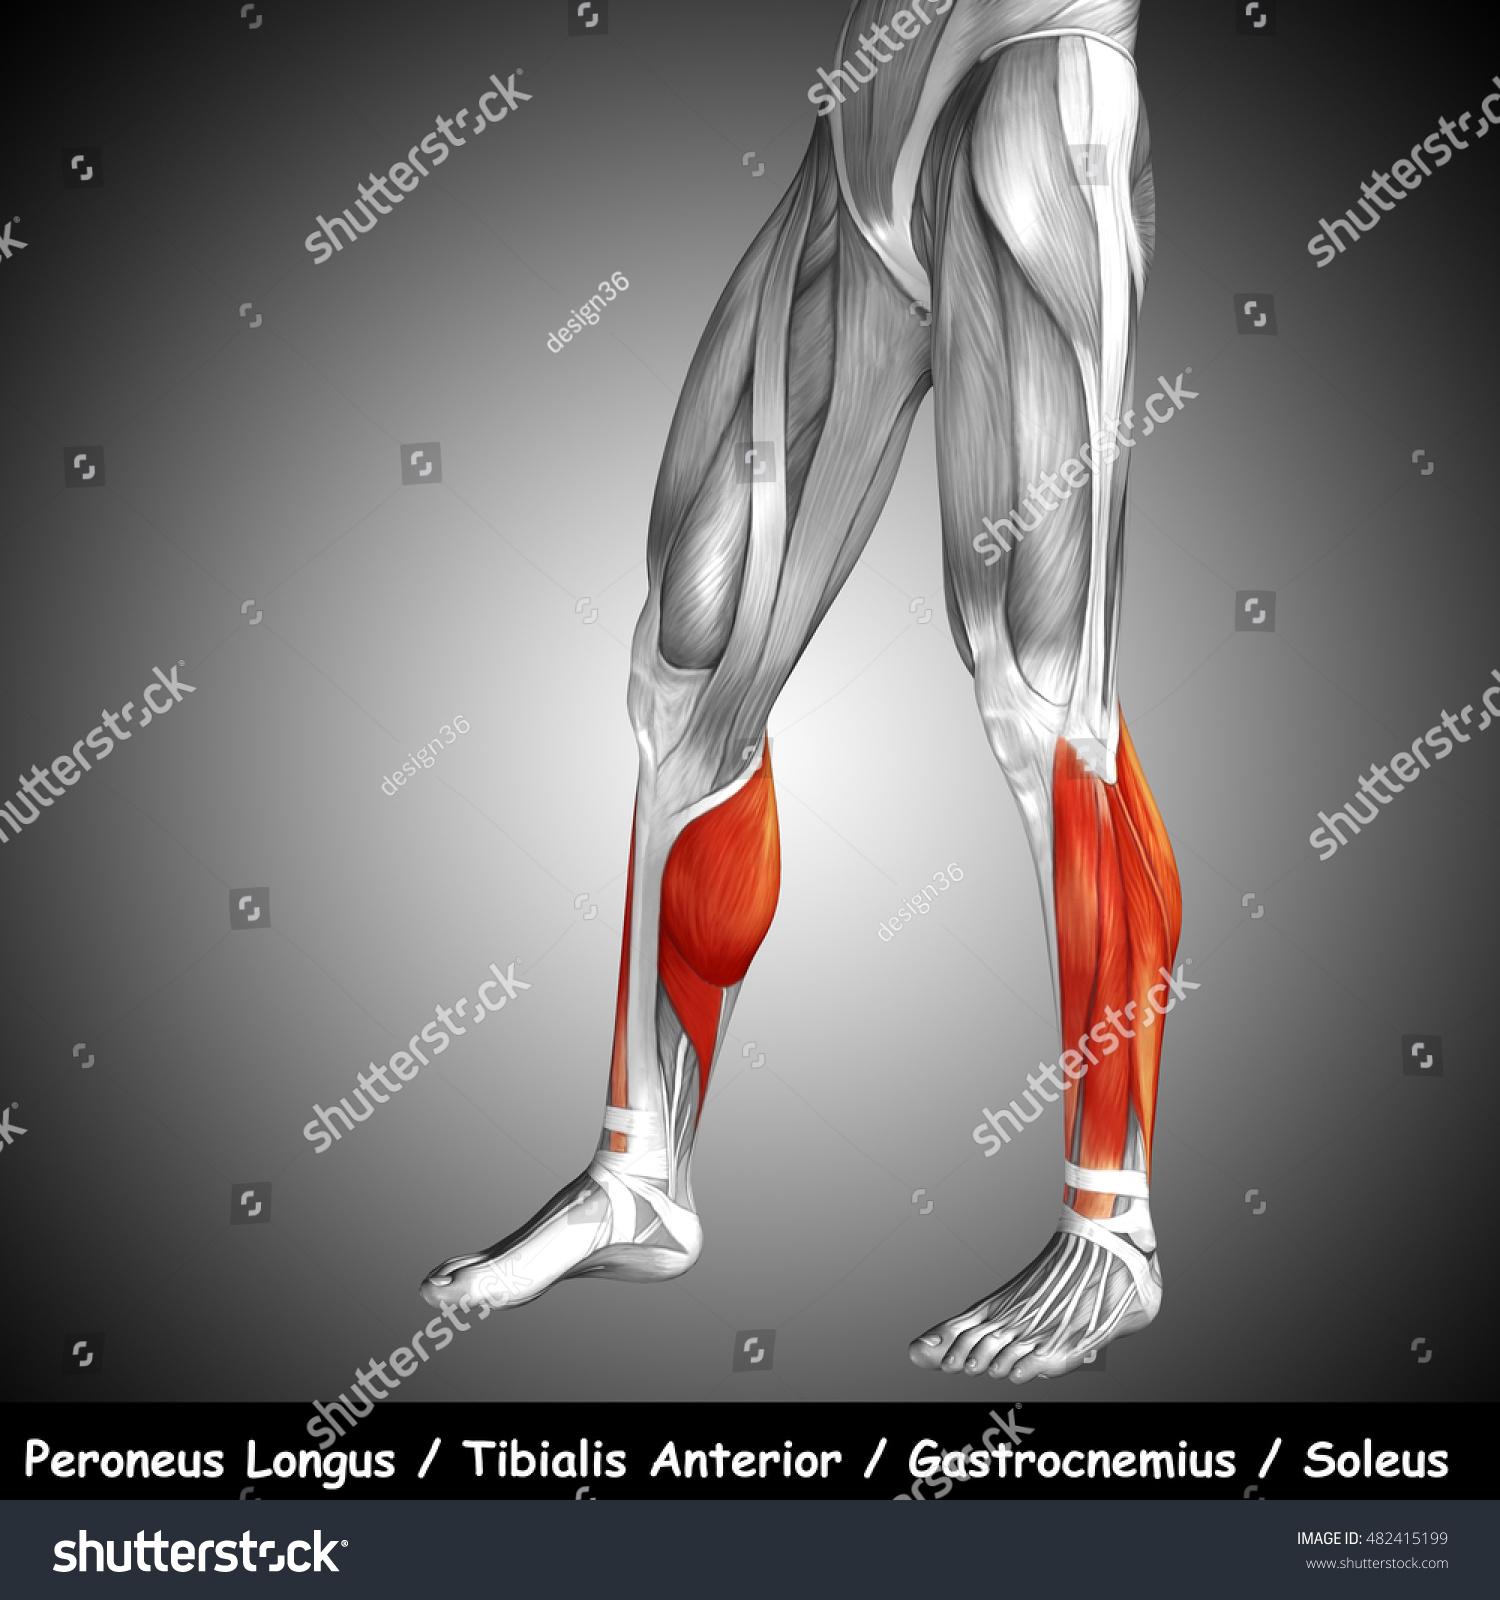 Peroneus longus tendon anatomy